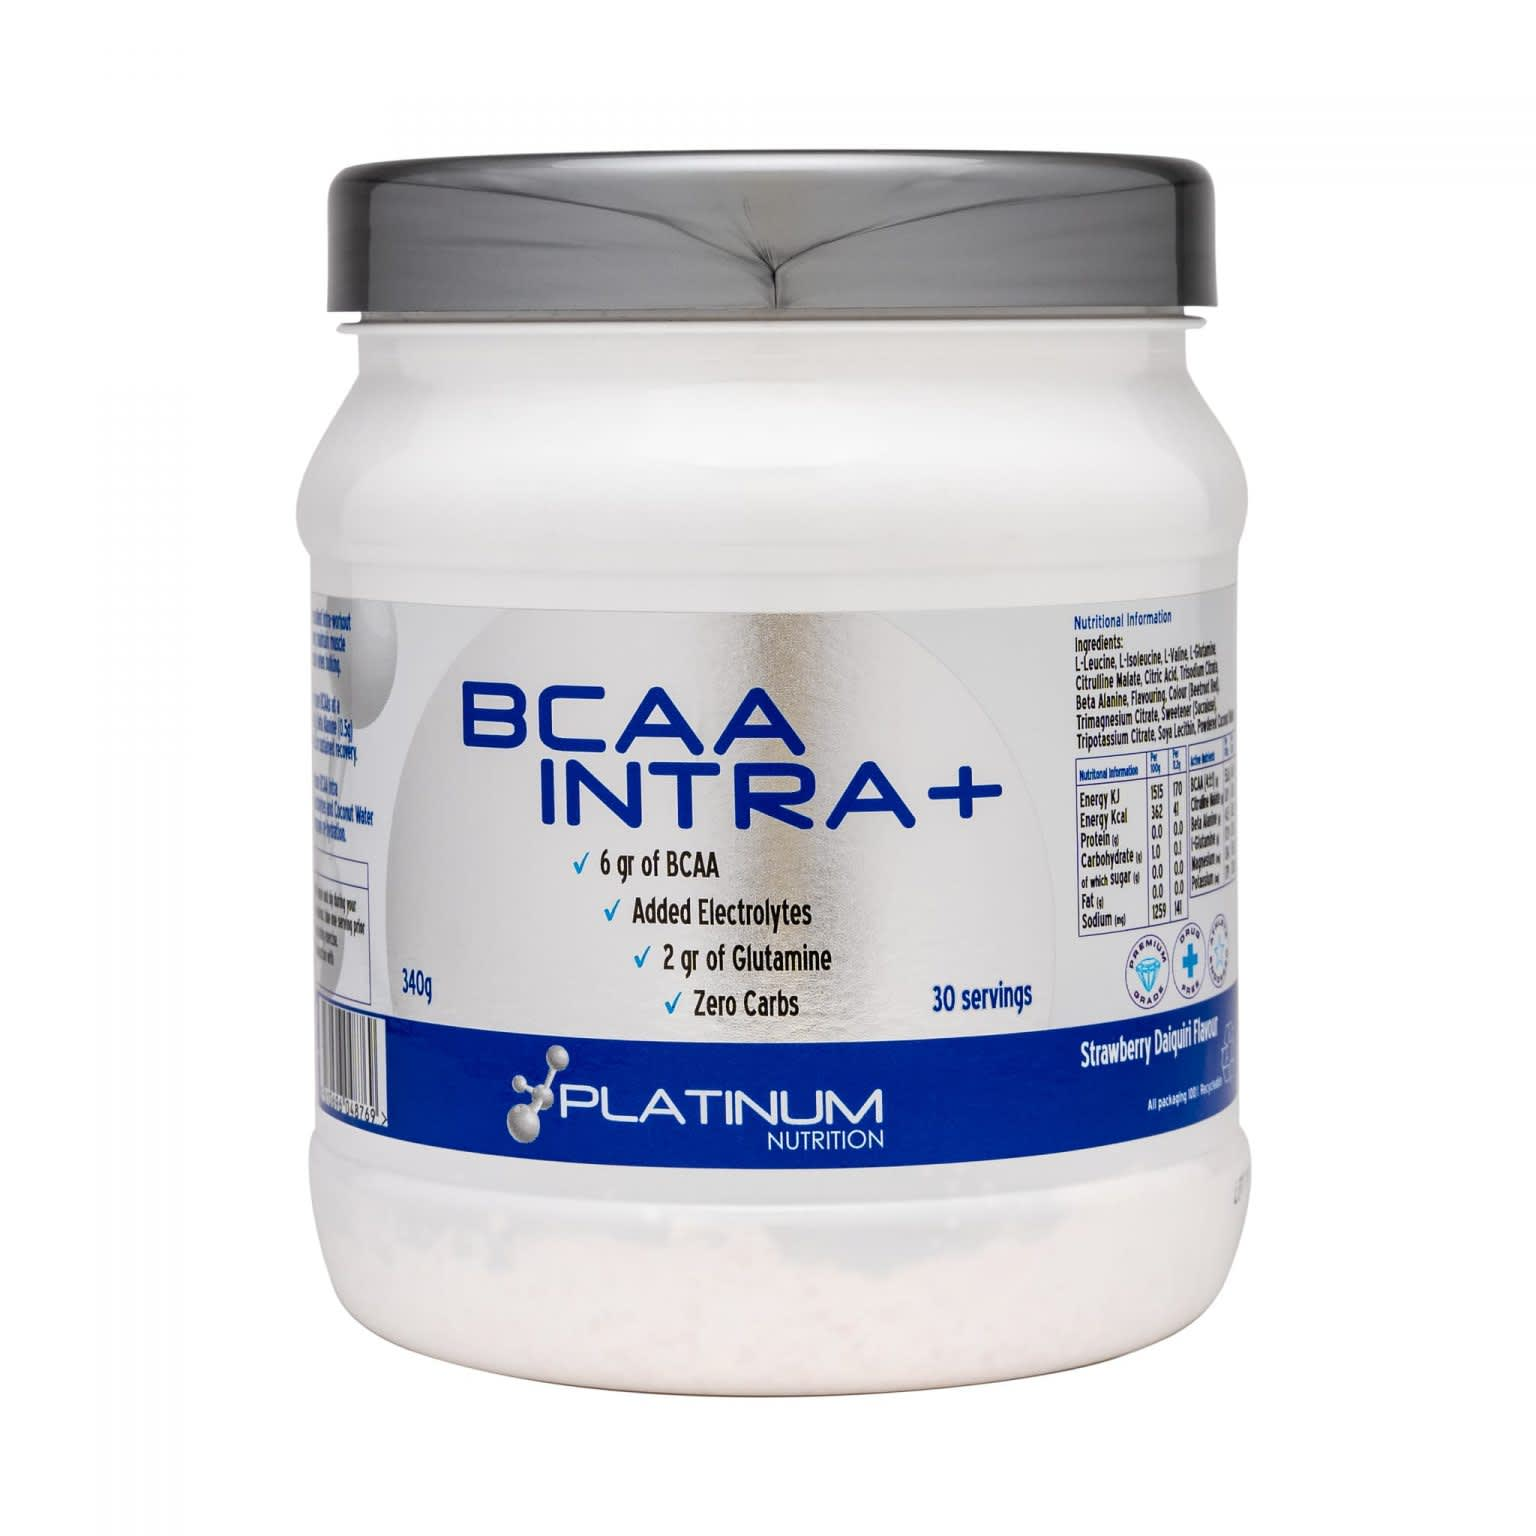 Platinum Nutrition – BCAA Intra + – 30 servings New Item